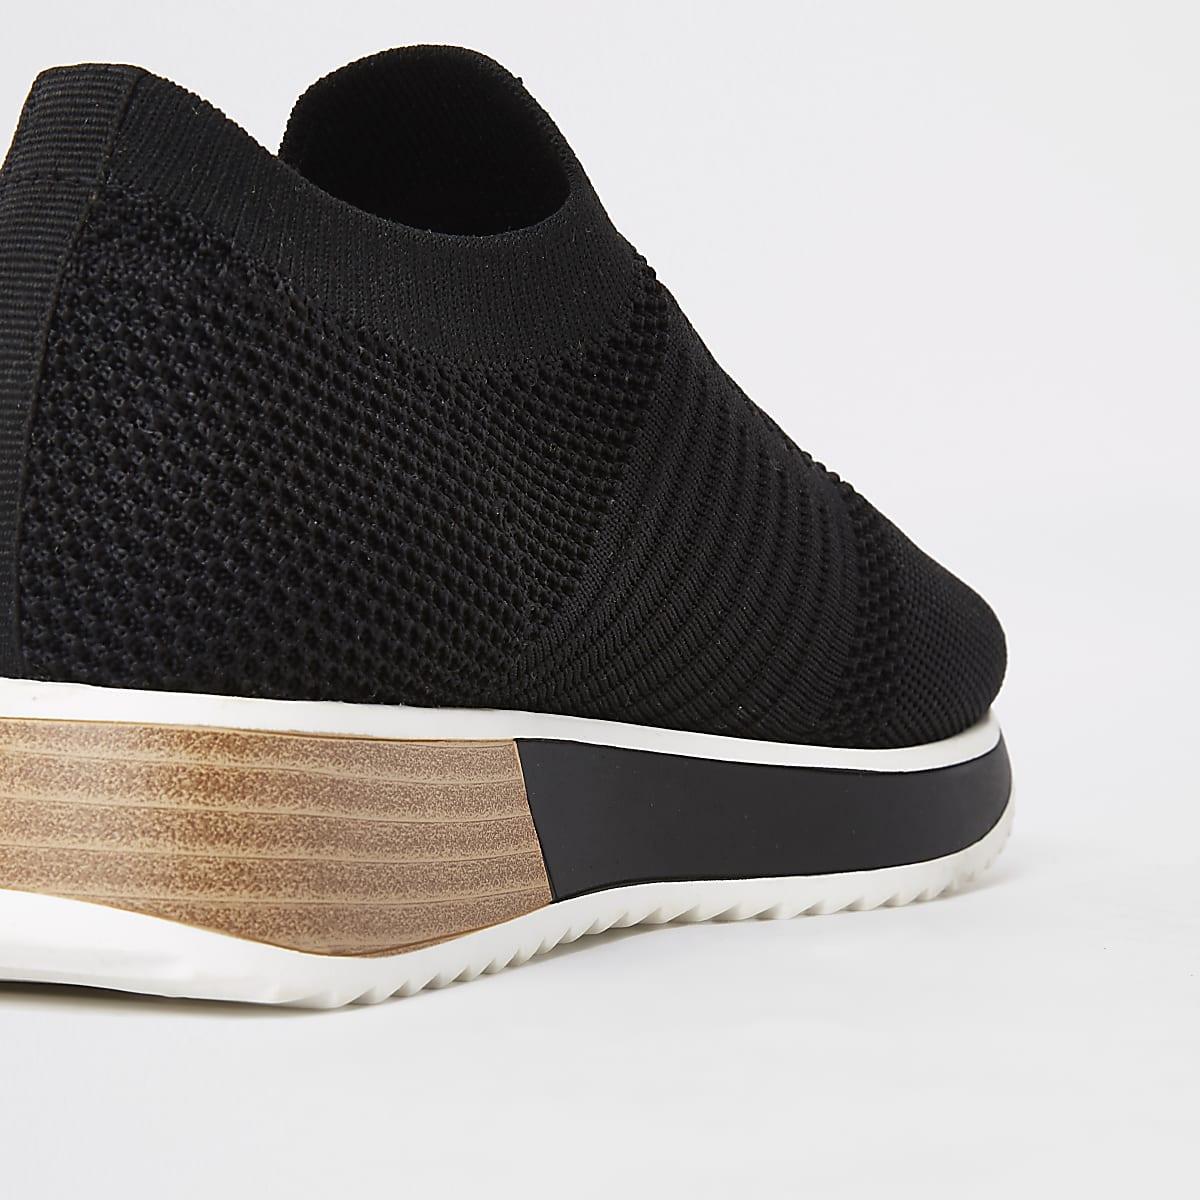 ee216e40950 Home · Dames · Schoenen en laarzen; Zwarte gebreide sneakers. Zwarte  gebreide sneakers ...